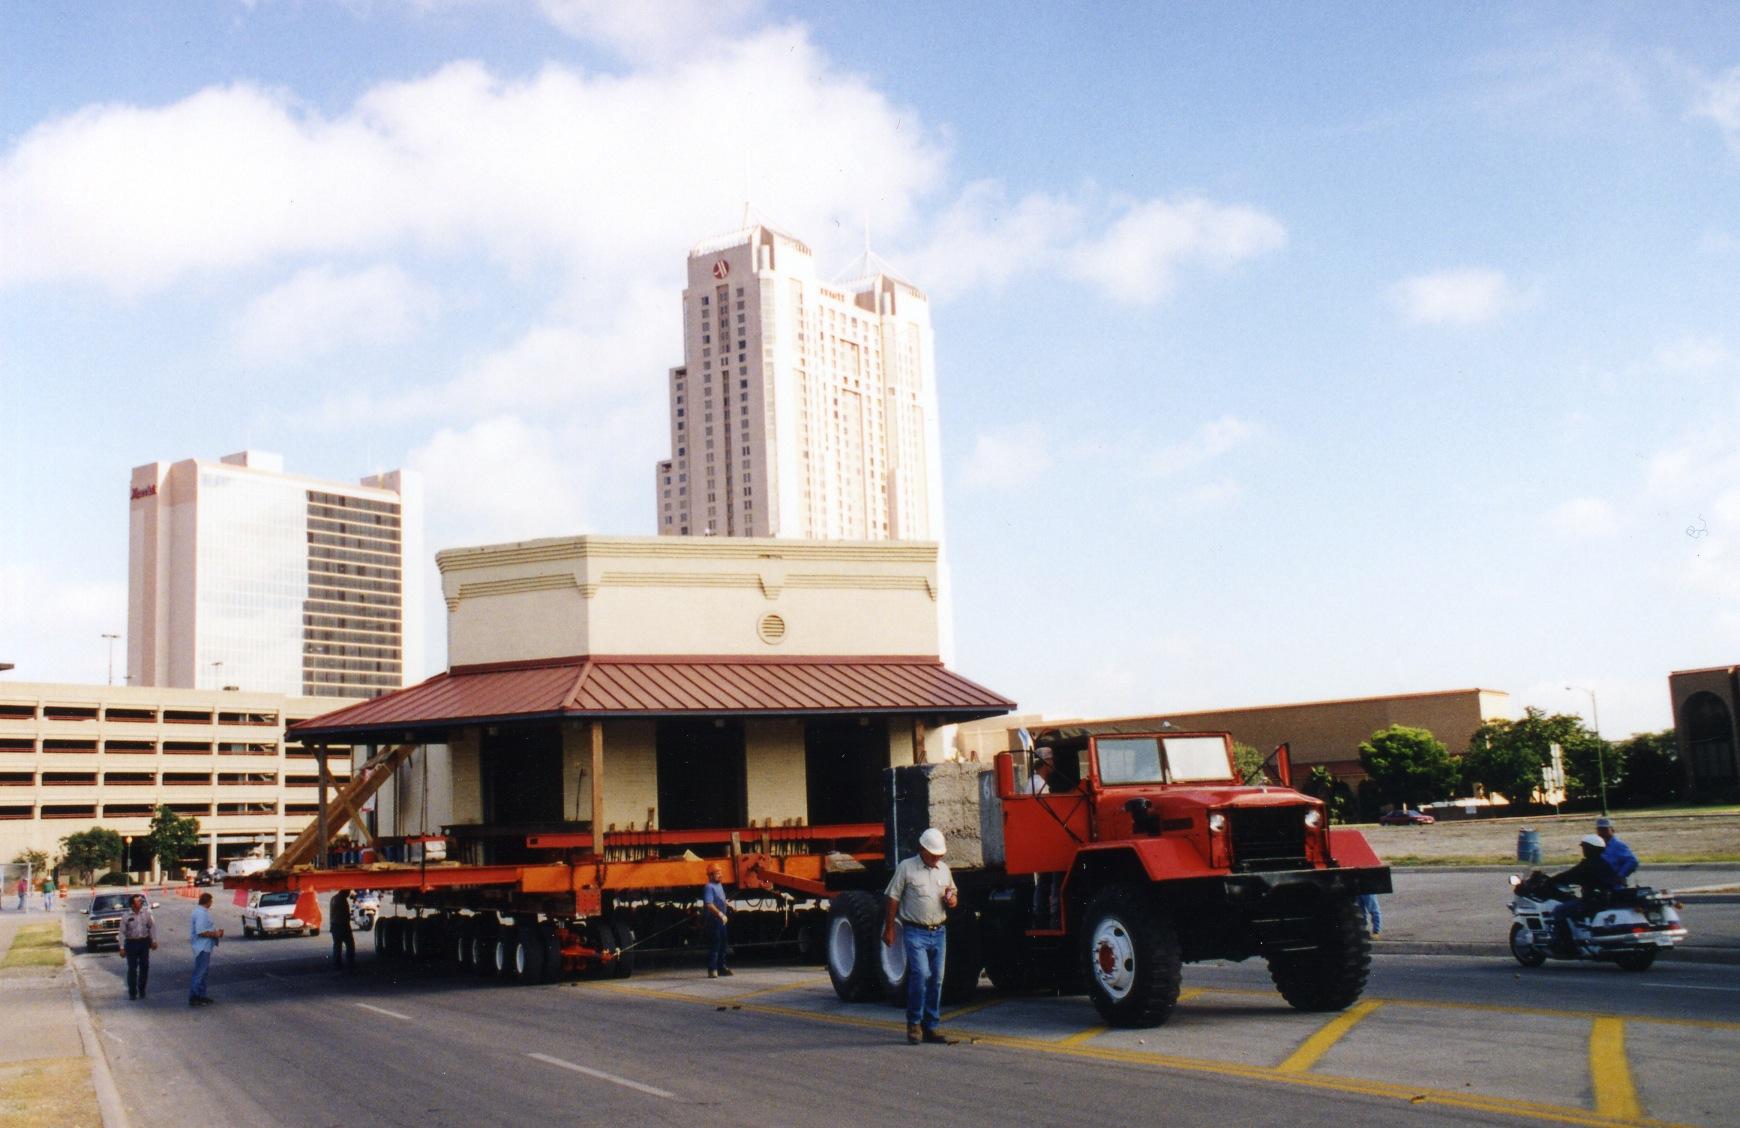 San Antonio OK Bar #4